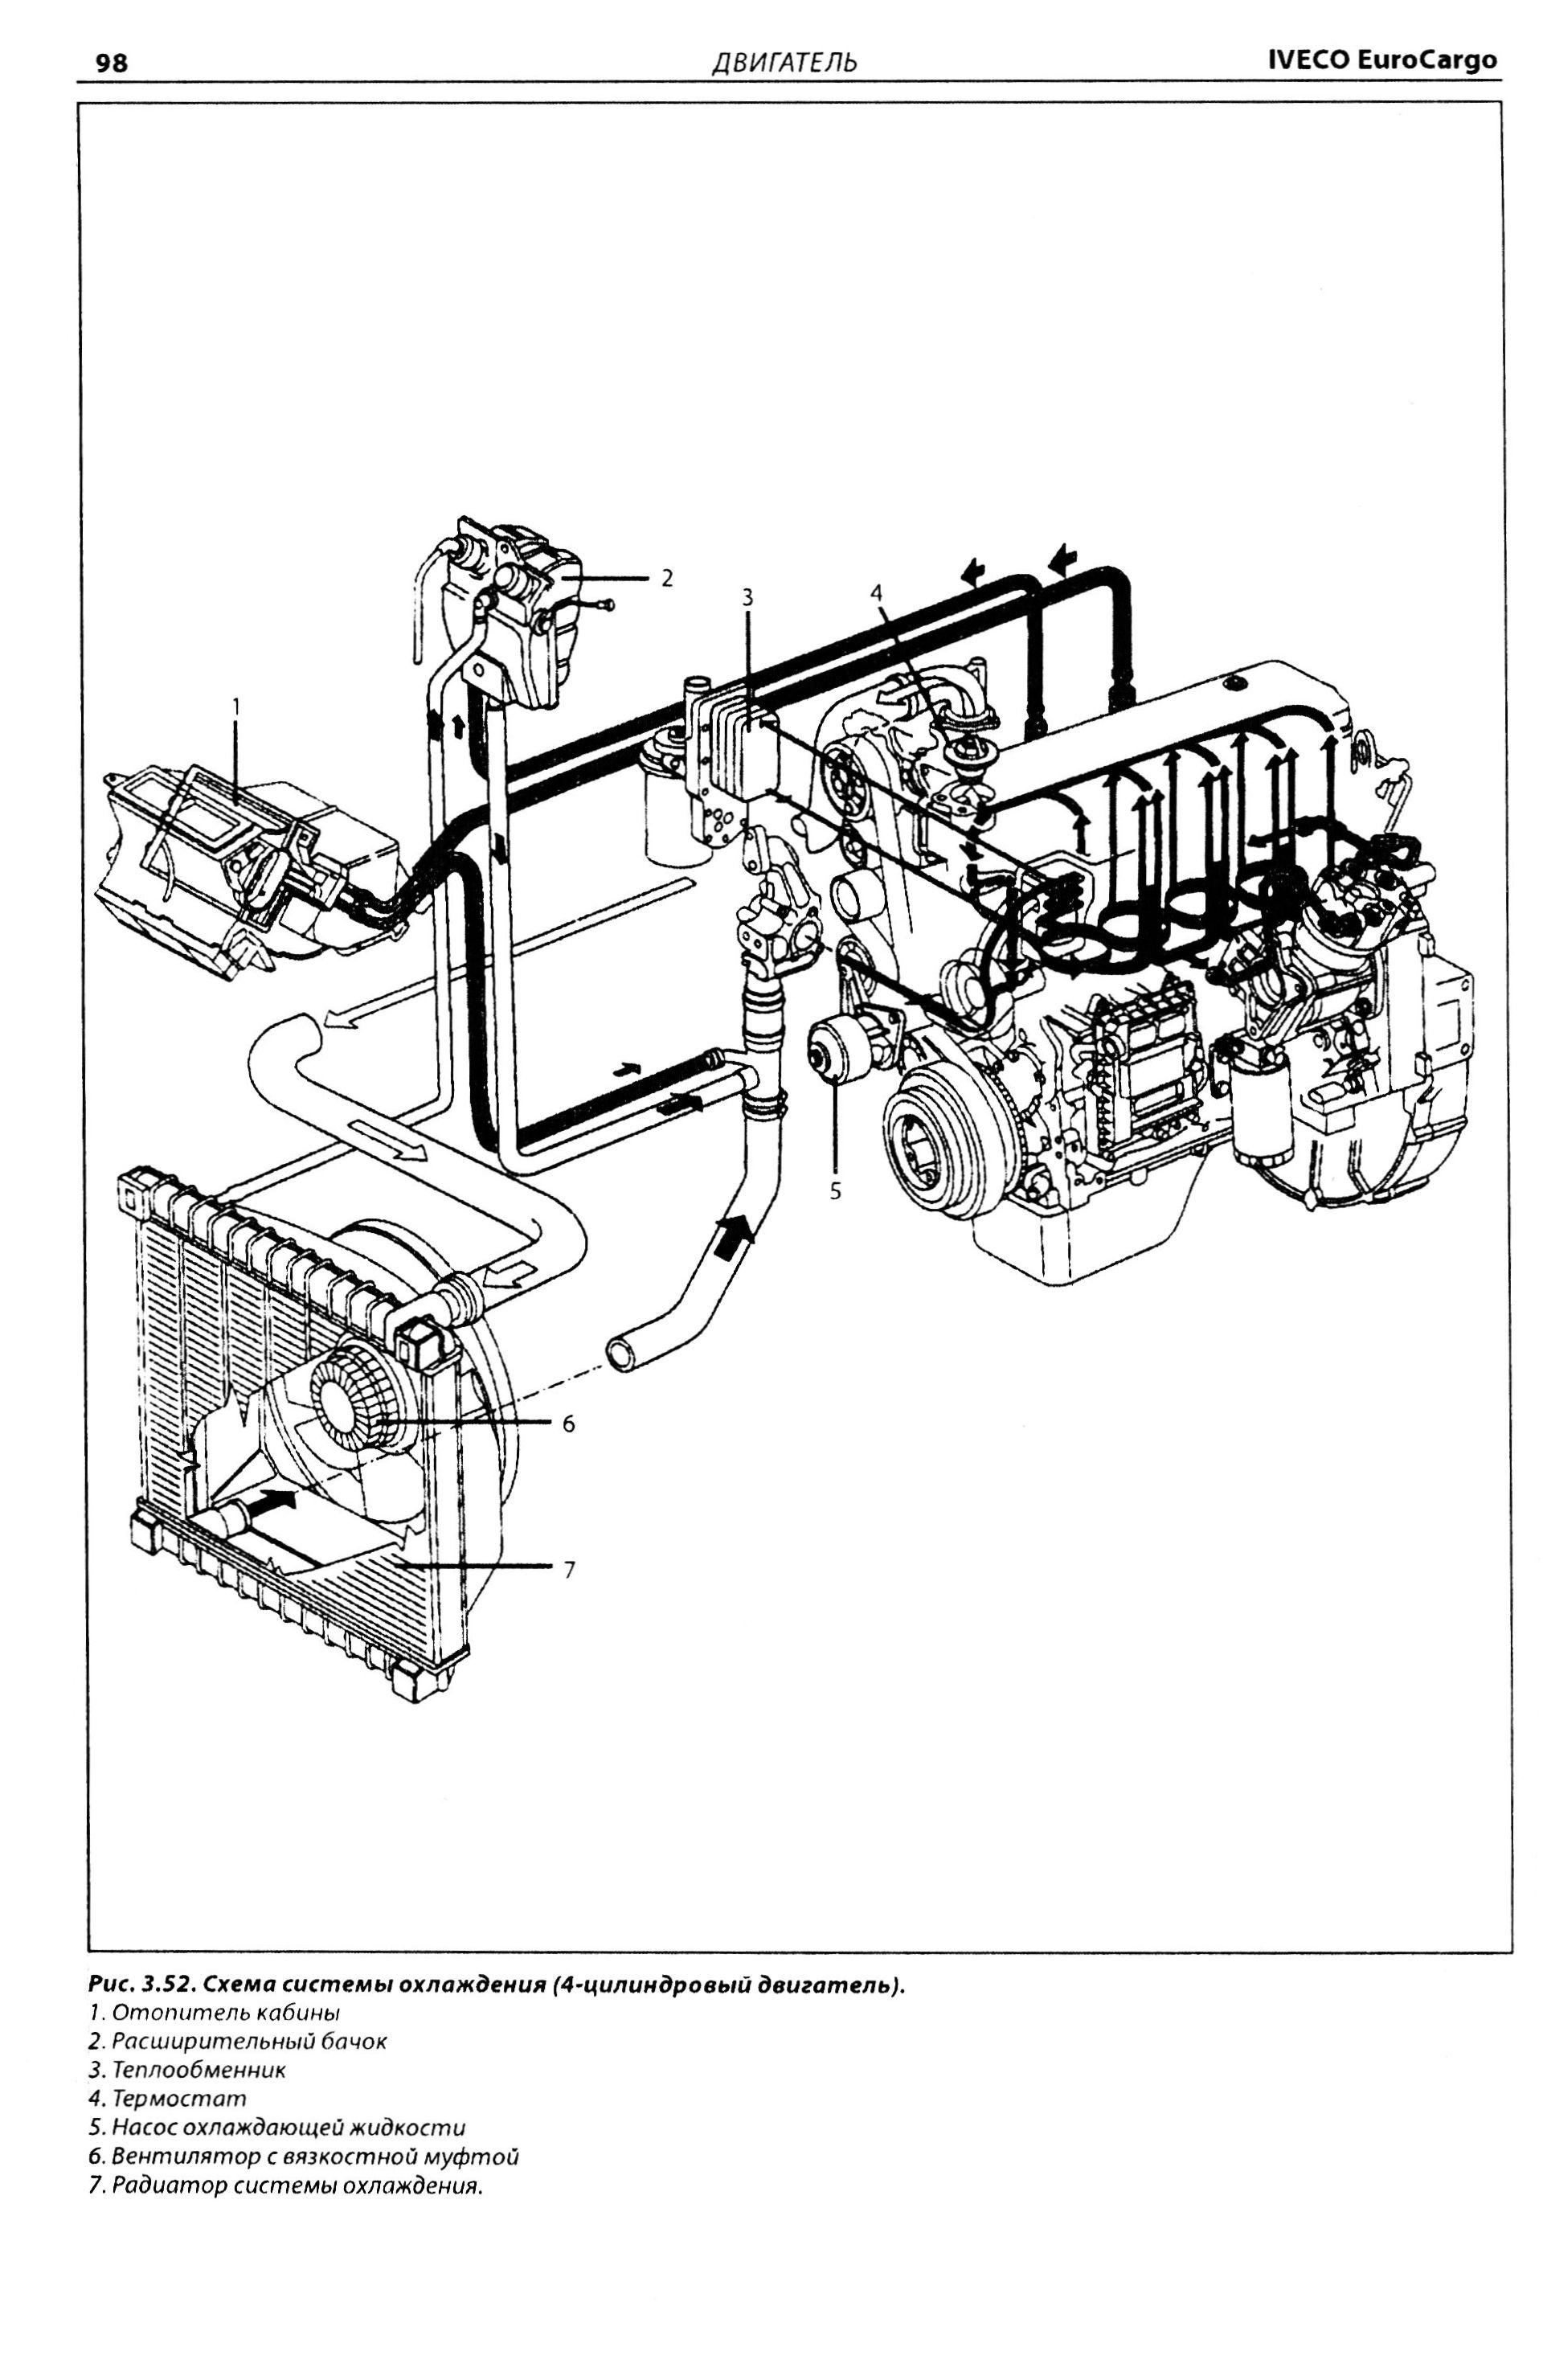 Автомобиль: ивеко дейли / iveco daily e iii (2000-2005)